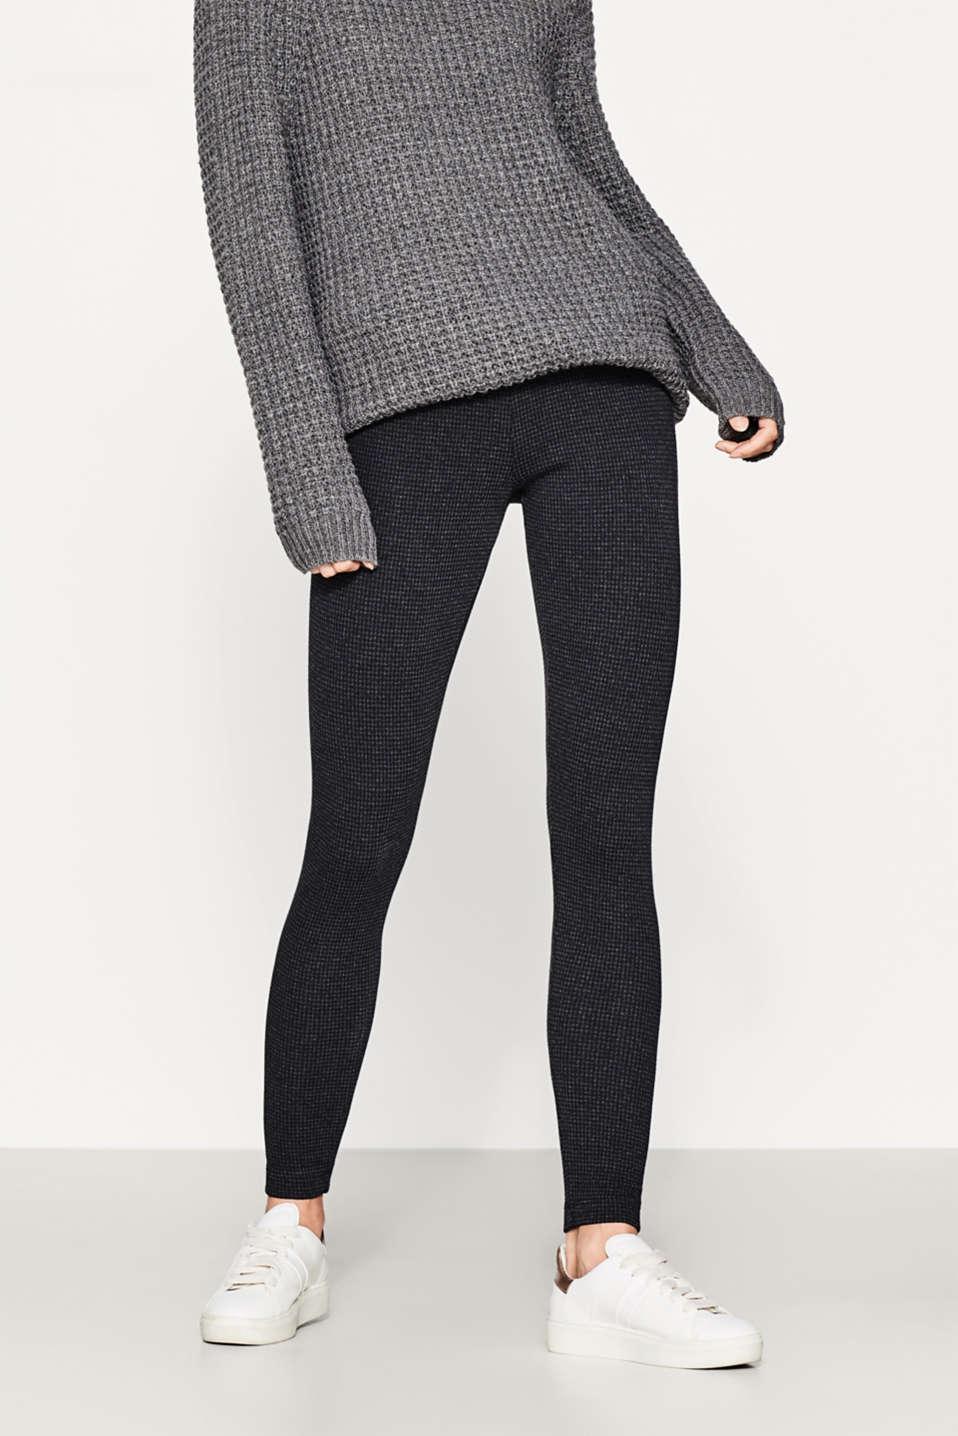 esprit leggings with a tonal houndstooth pattern at our online shop. Black Bedroom Furniture Sets. Home Design Ideas